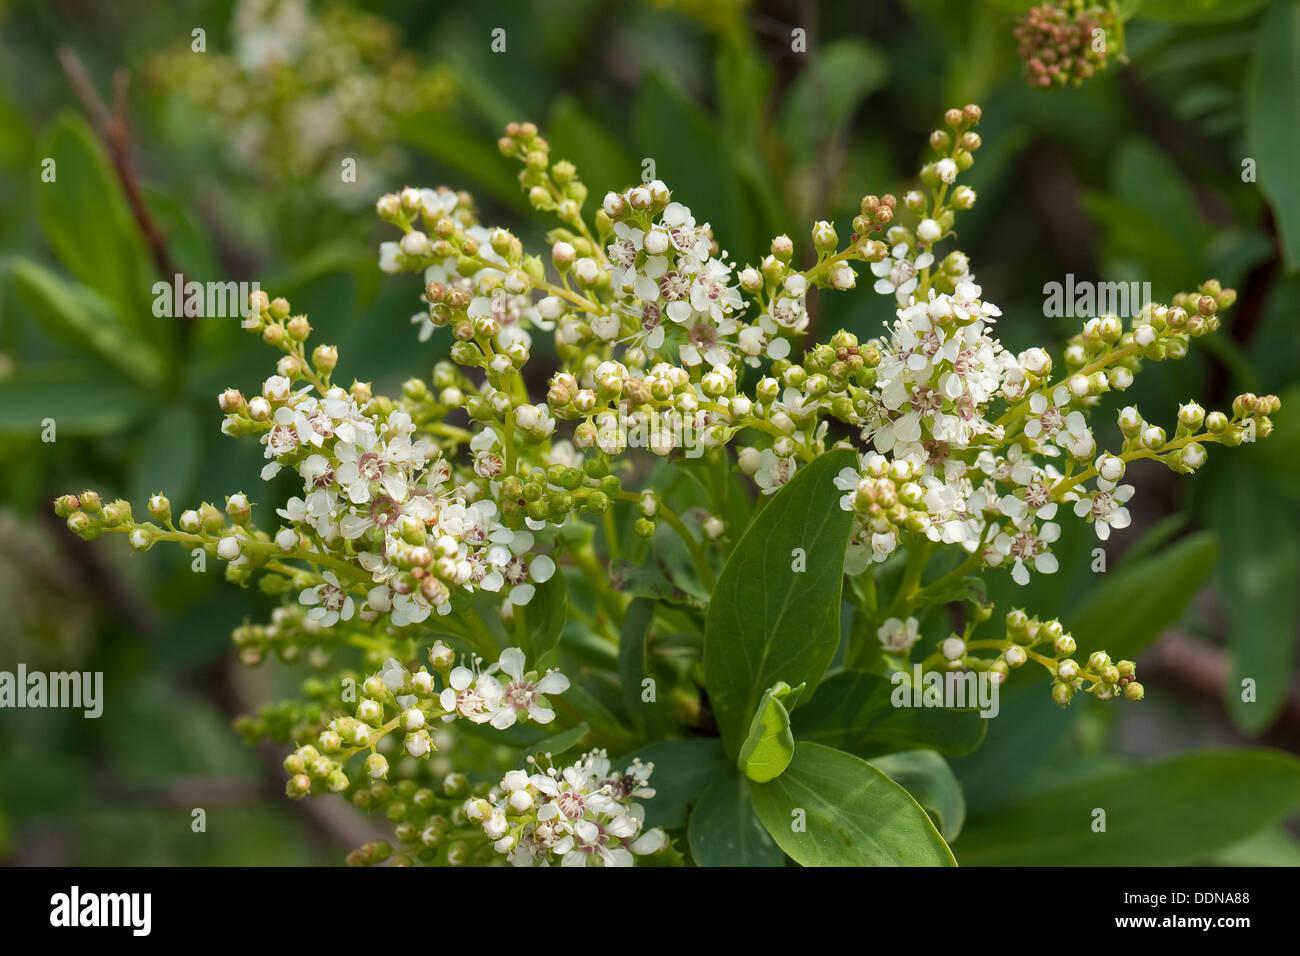 Croatian Sibirea, Blauspiere, Kroatische Blauspiere, Sibirische Blauspiere, Sibiraea altaiensis croatica, Sibiraea laevigata - Stock Image